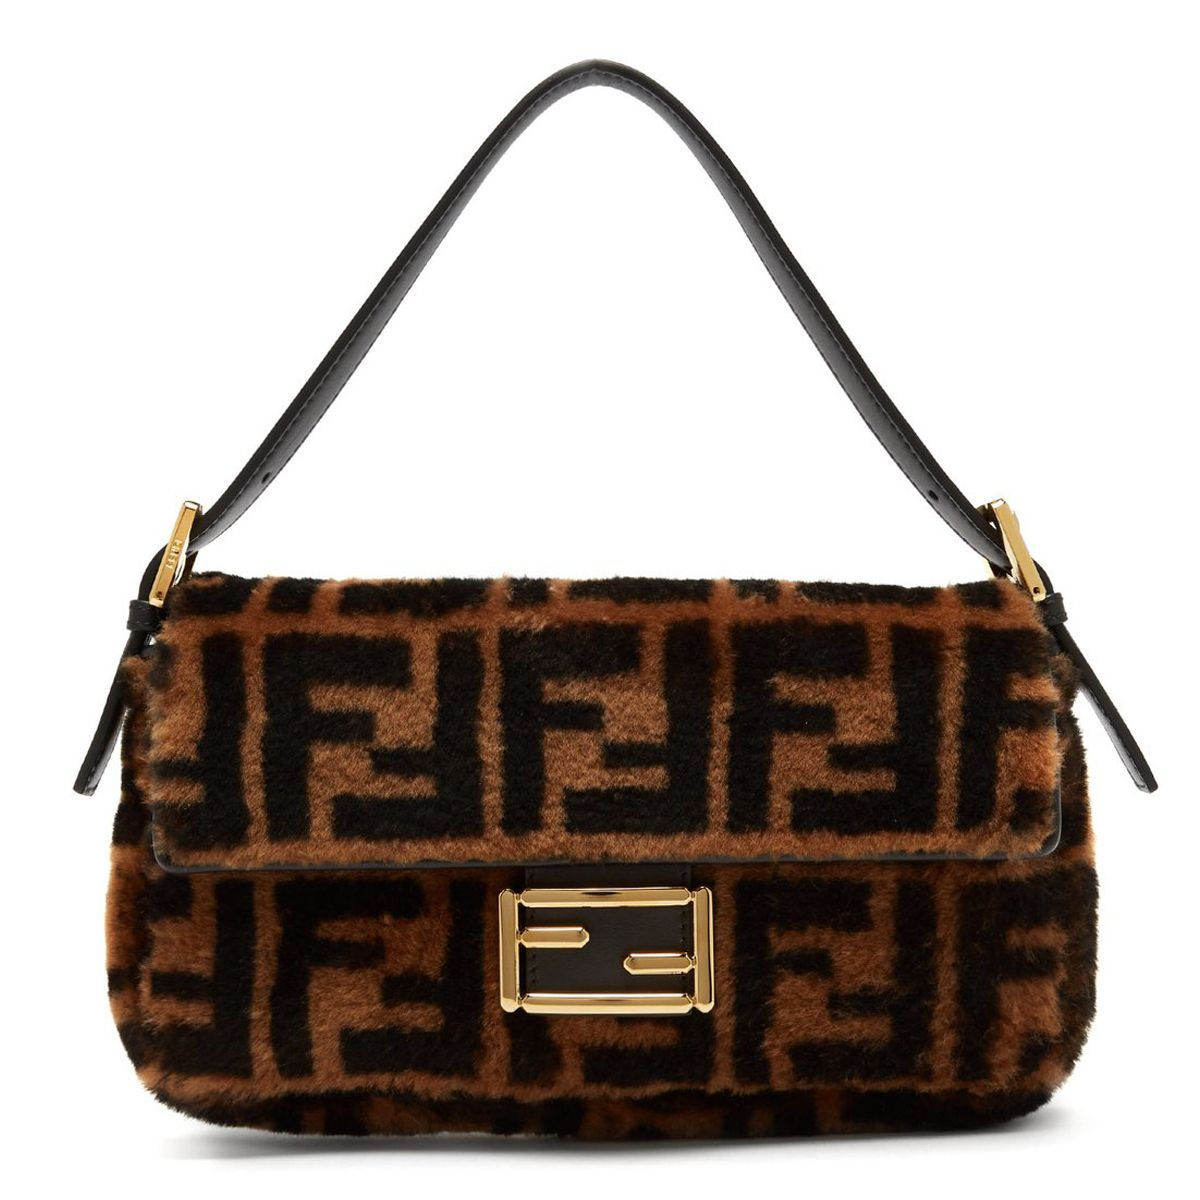 classic-designer-handbag-brands-271996-1541601307432-product.1200x0c.jpg (1200×1200)